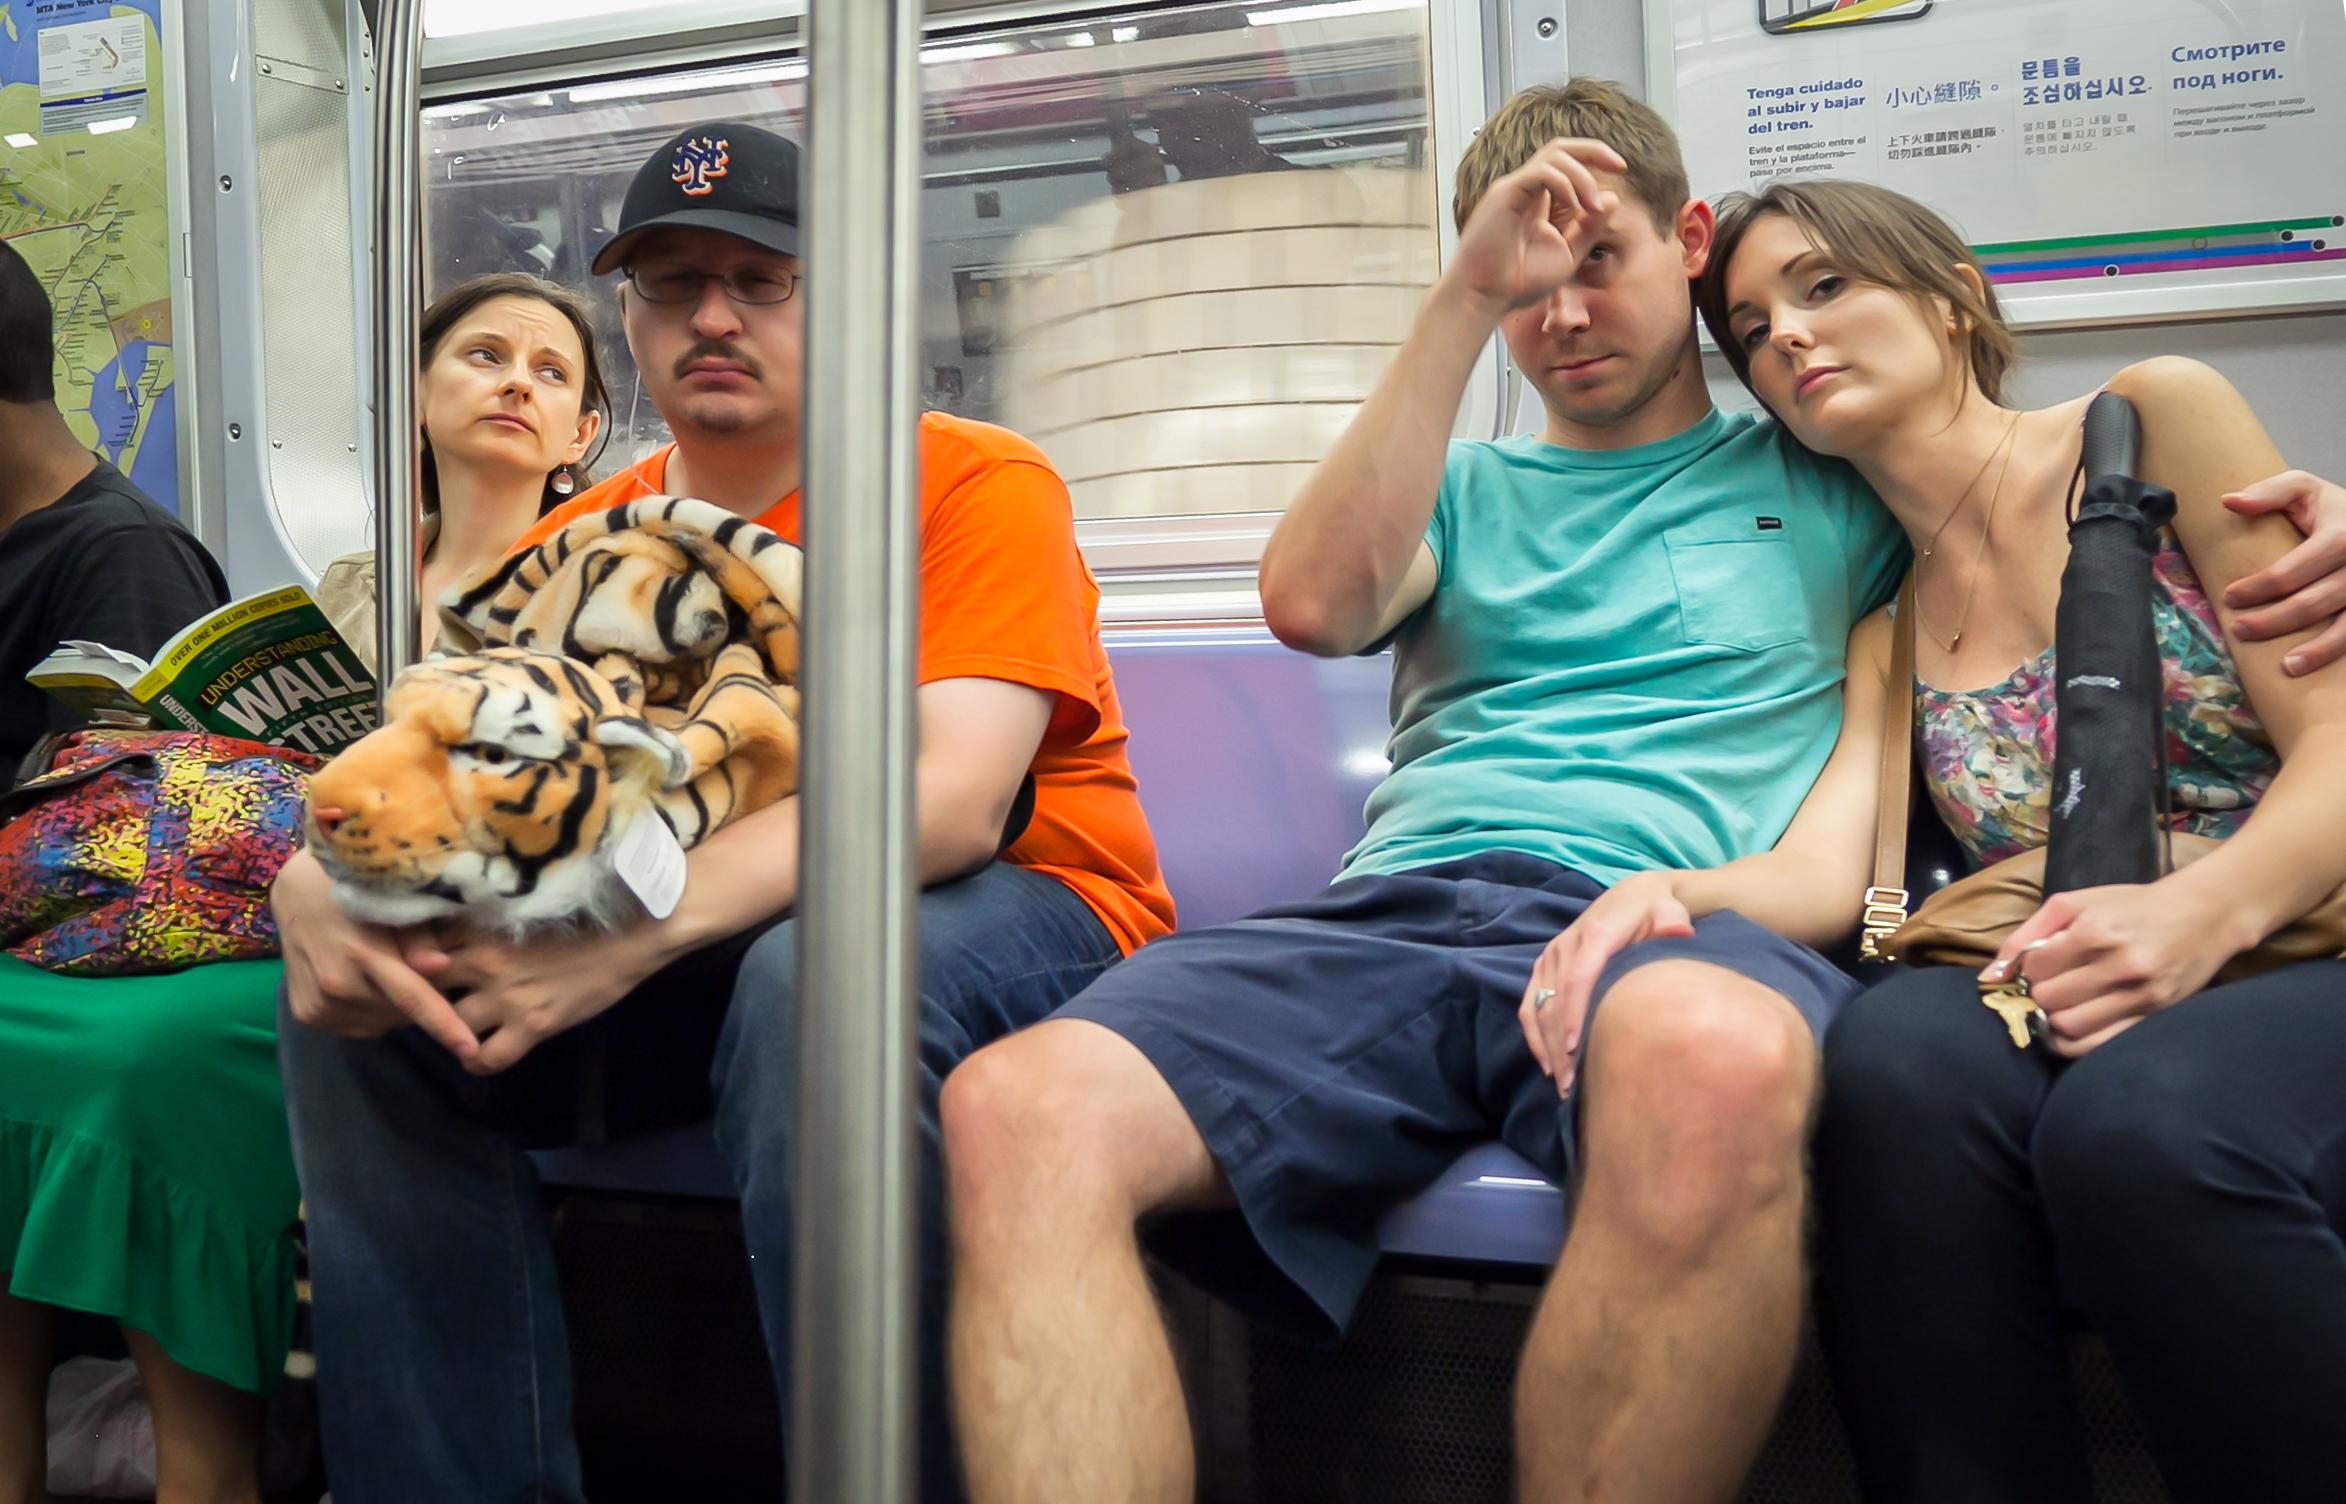 20110910-20110910-SubwayTiger 1.jpg